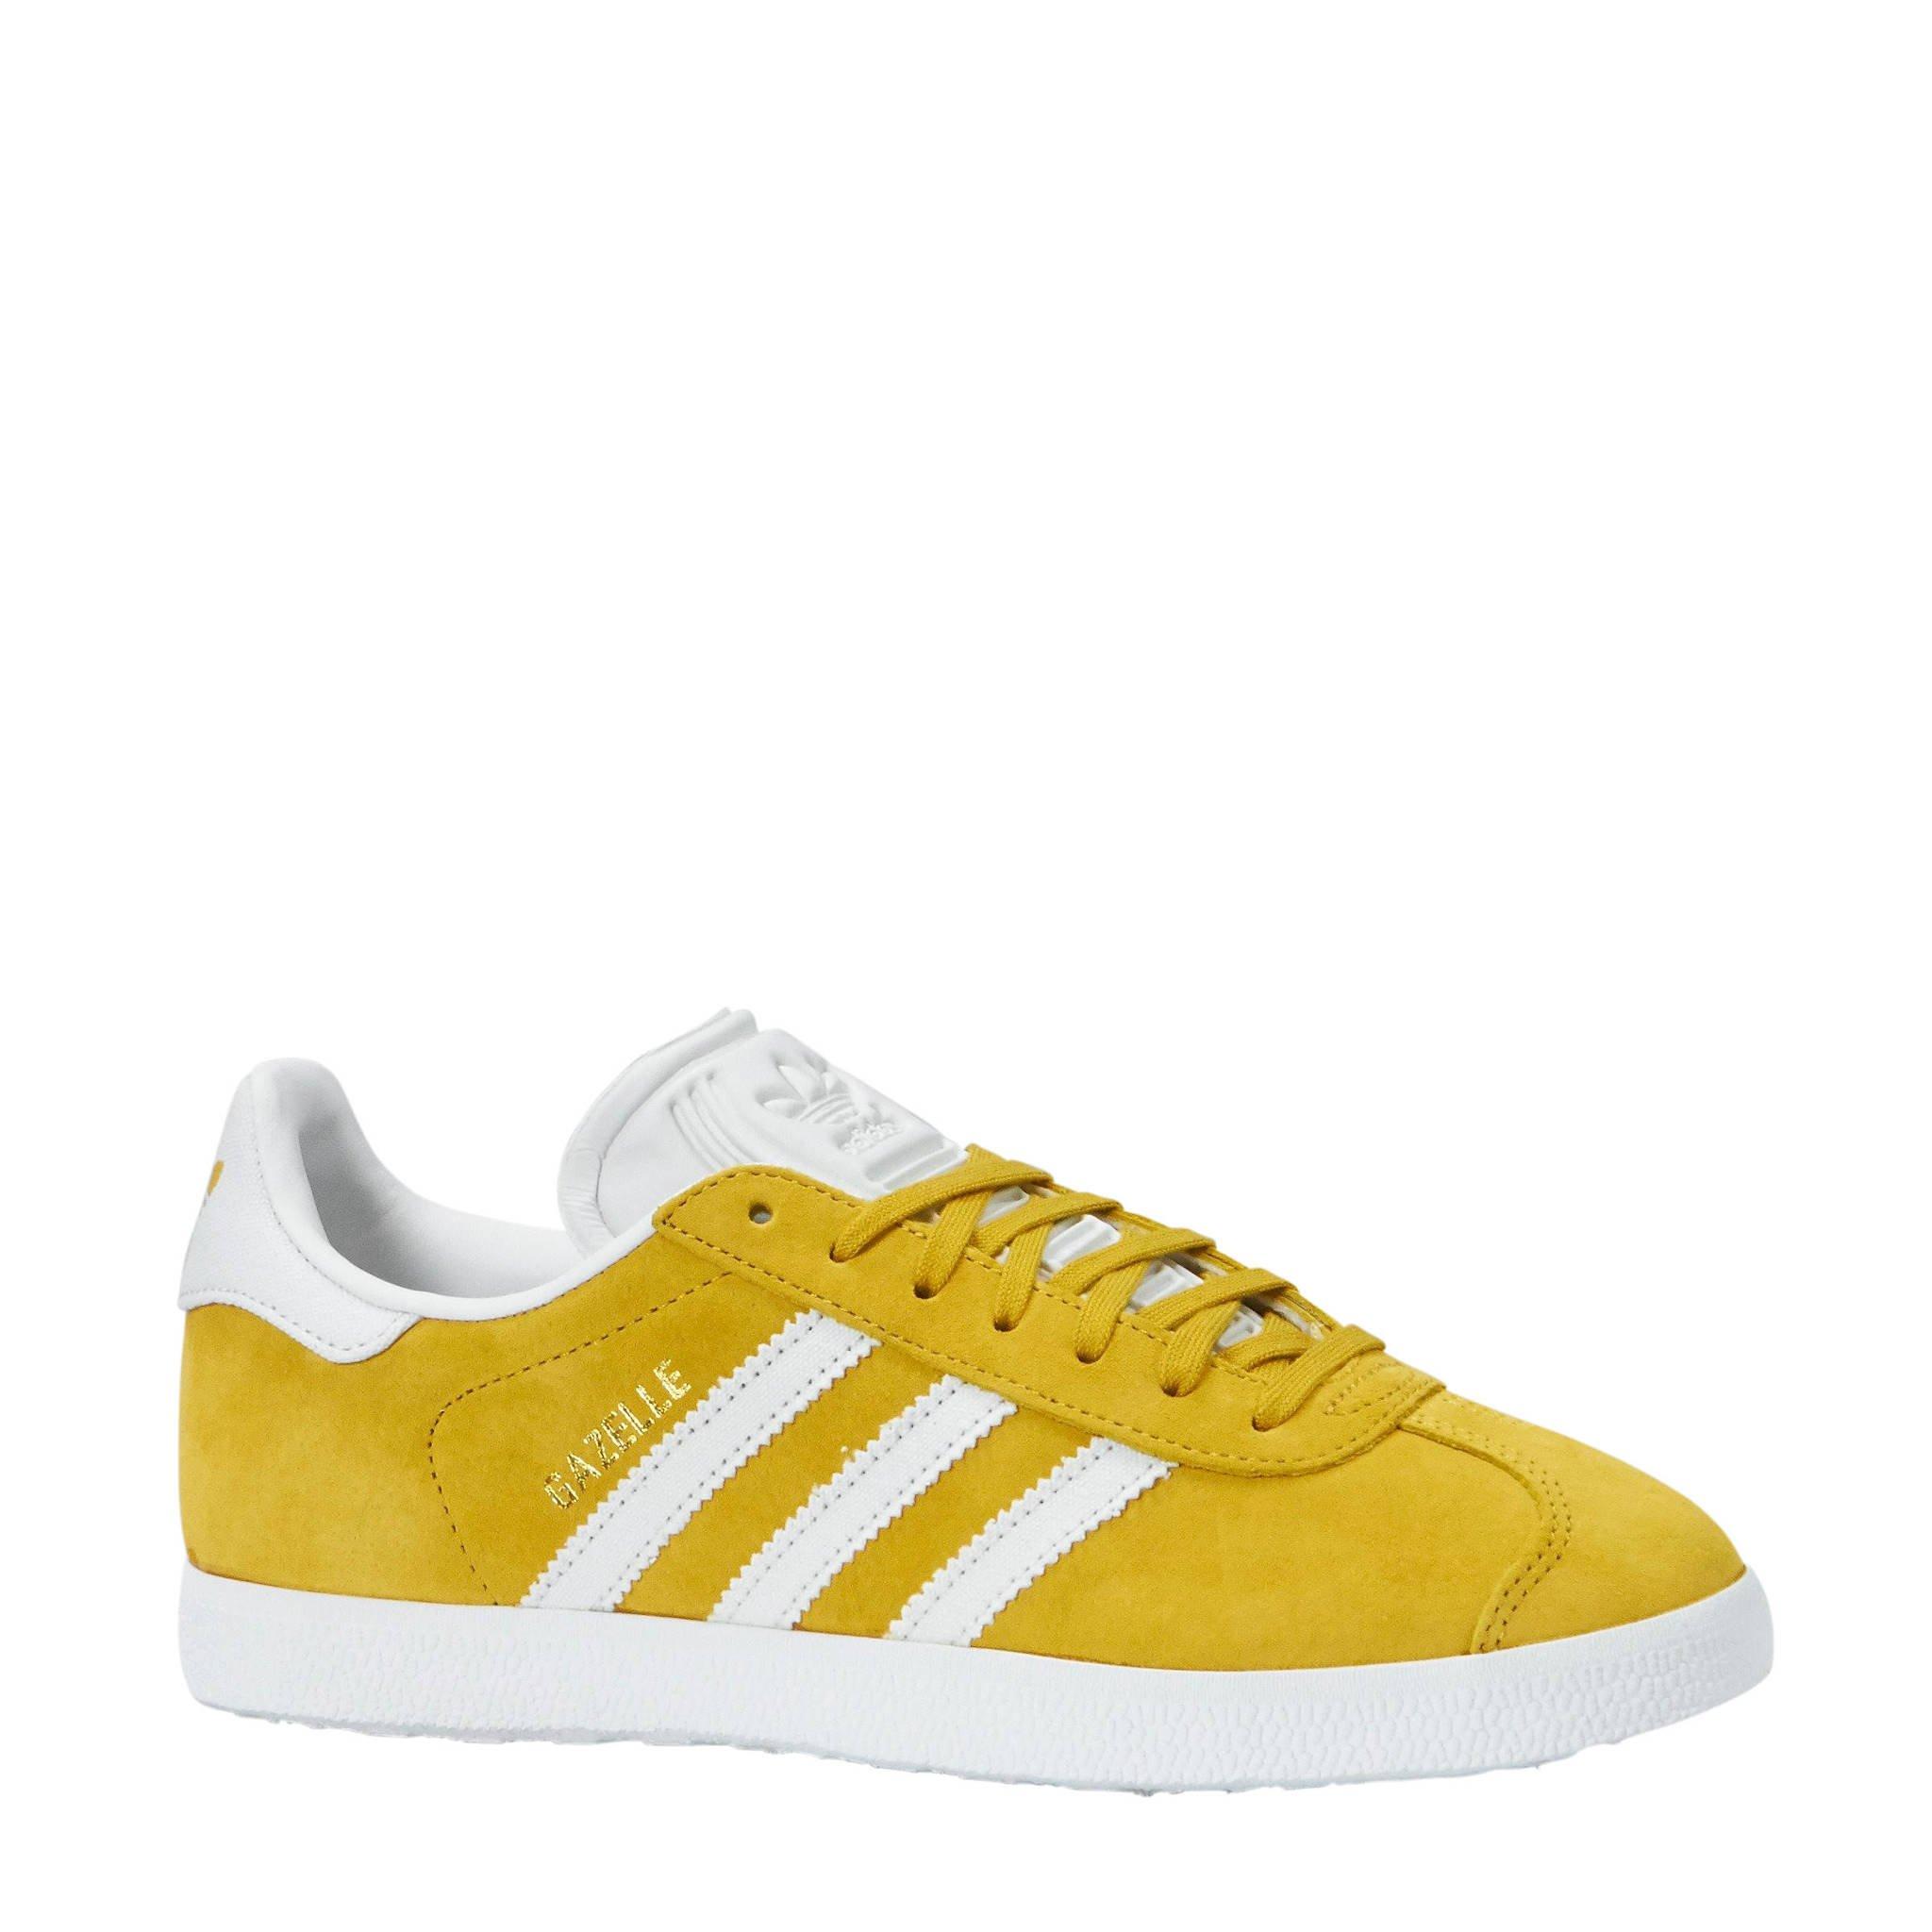 ec31e544f57 adidas originals Gazelle sneakers okergeel/wit   wehkamp